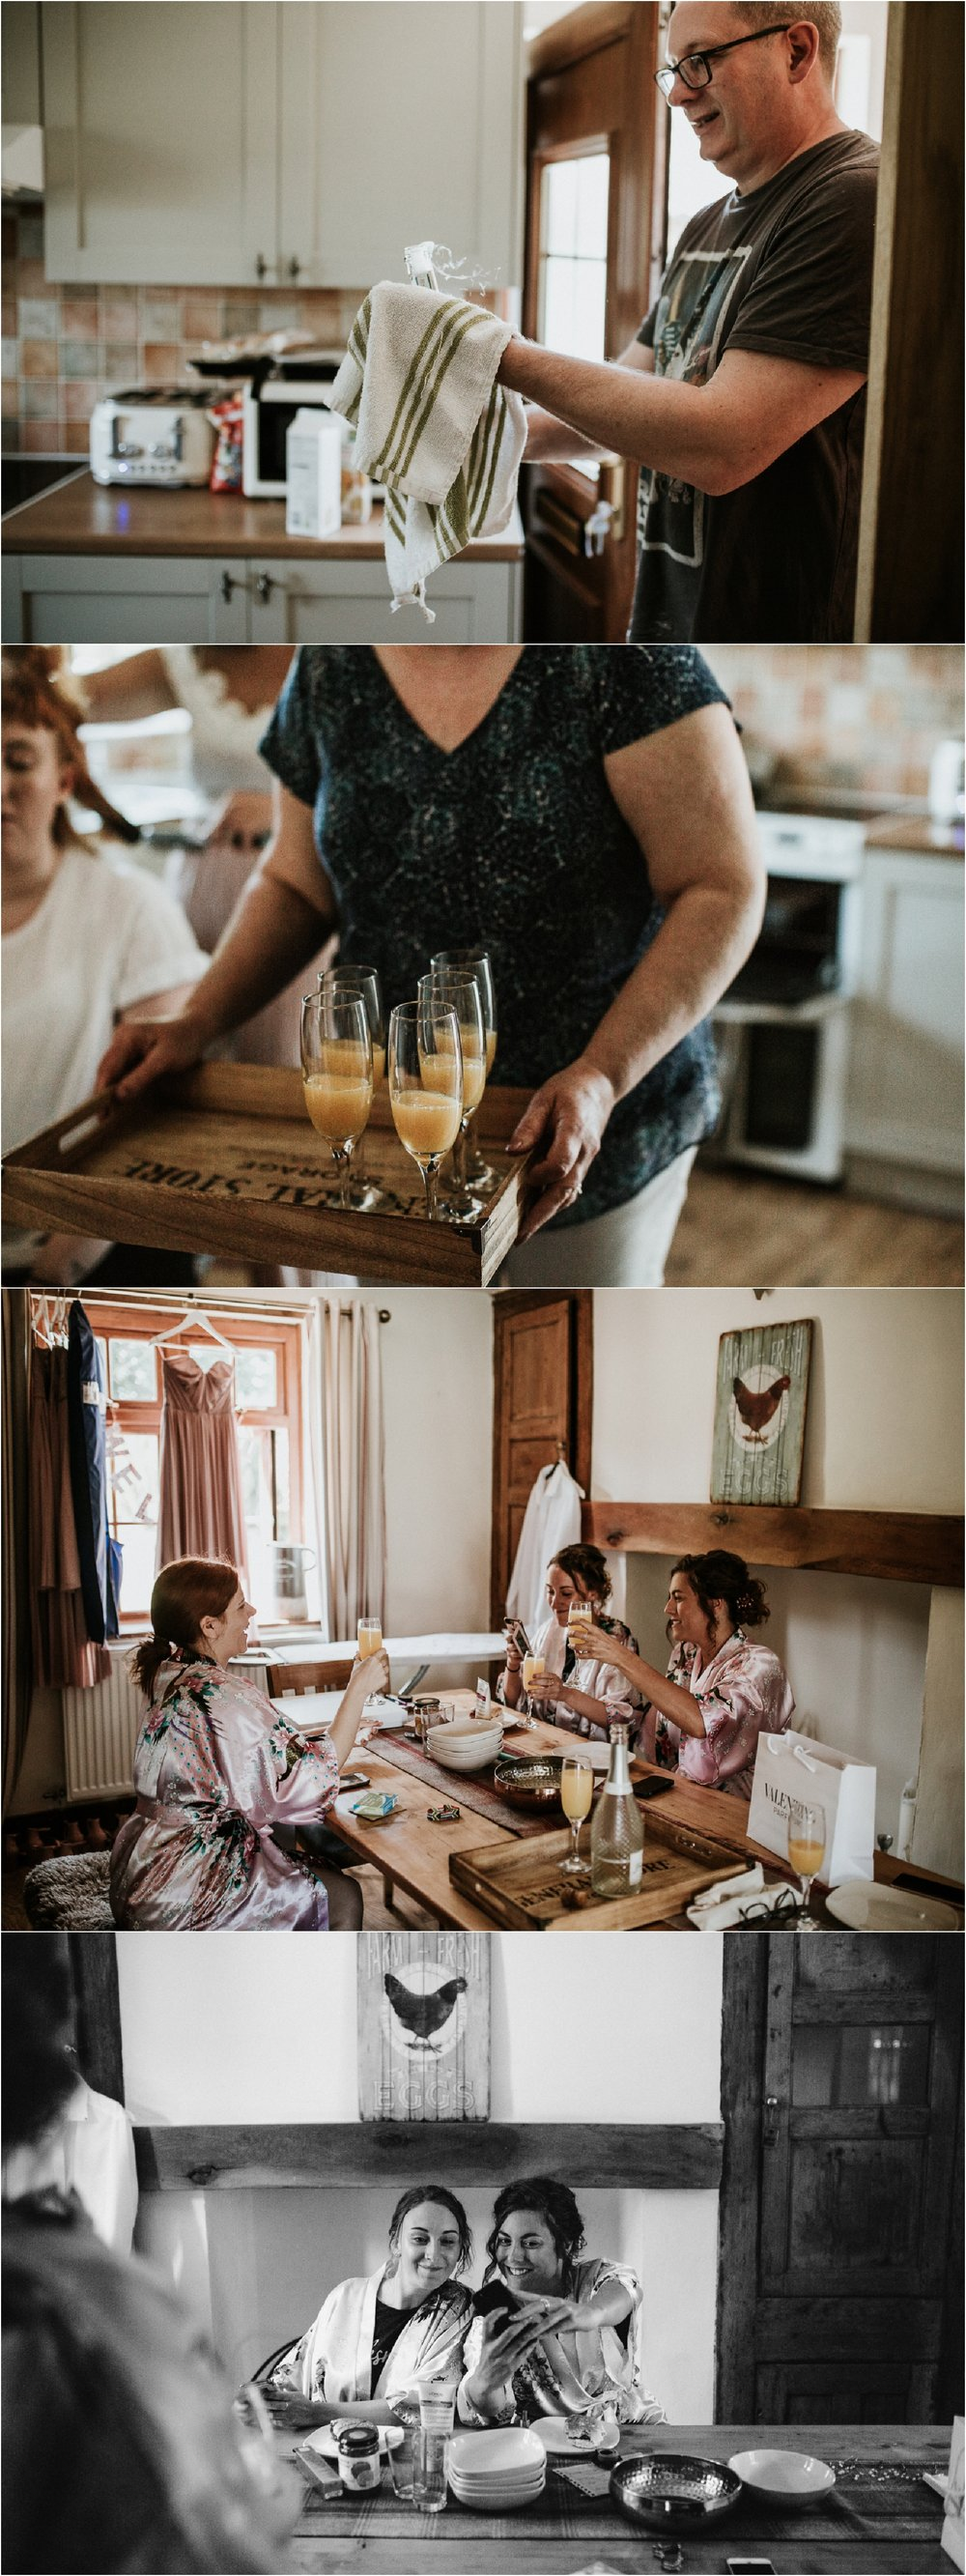 Herefordshire-uk-wedding-photographer_0026.jpg